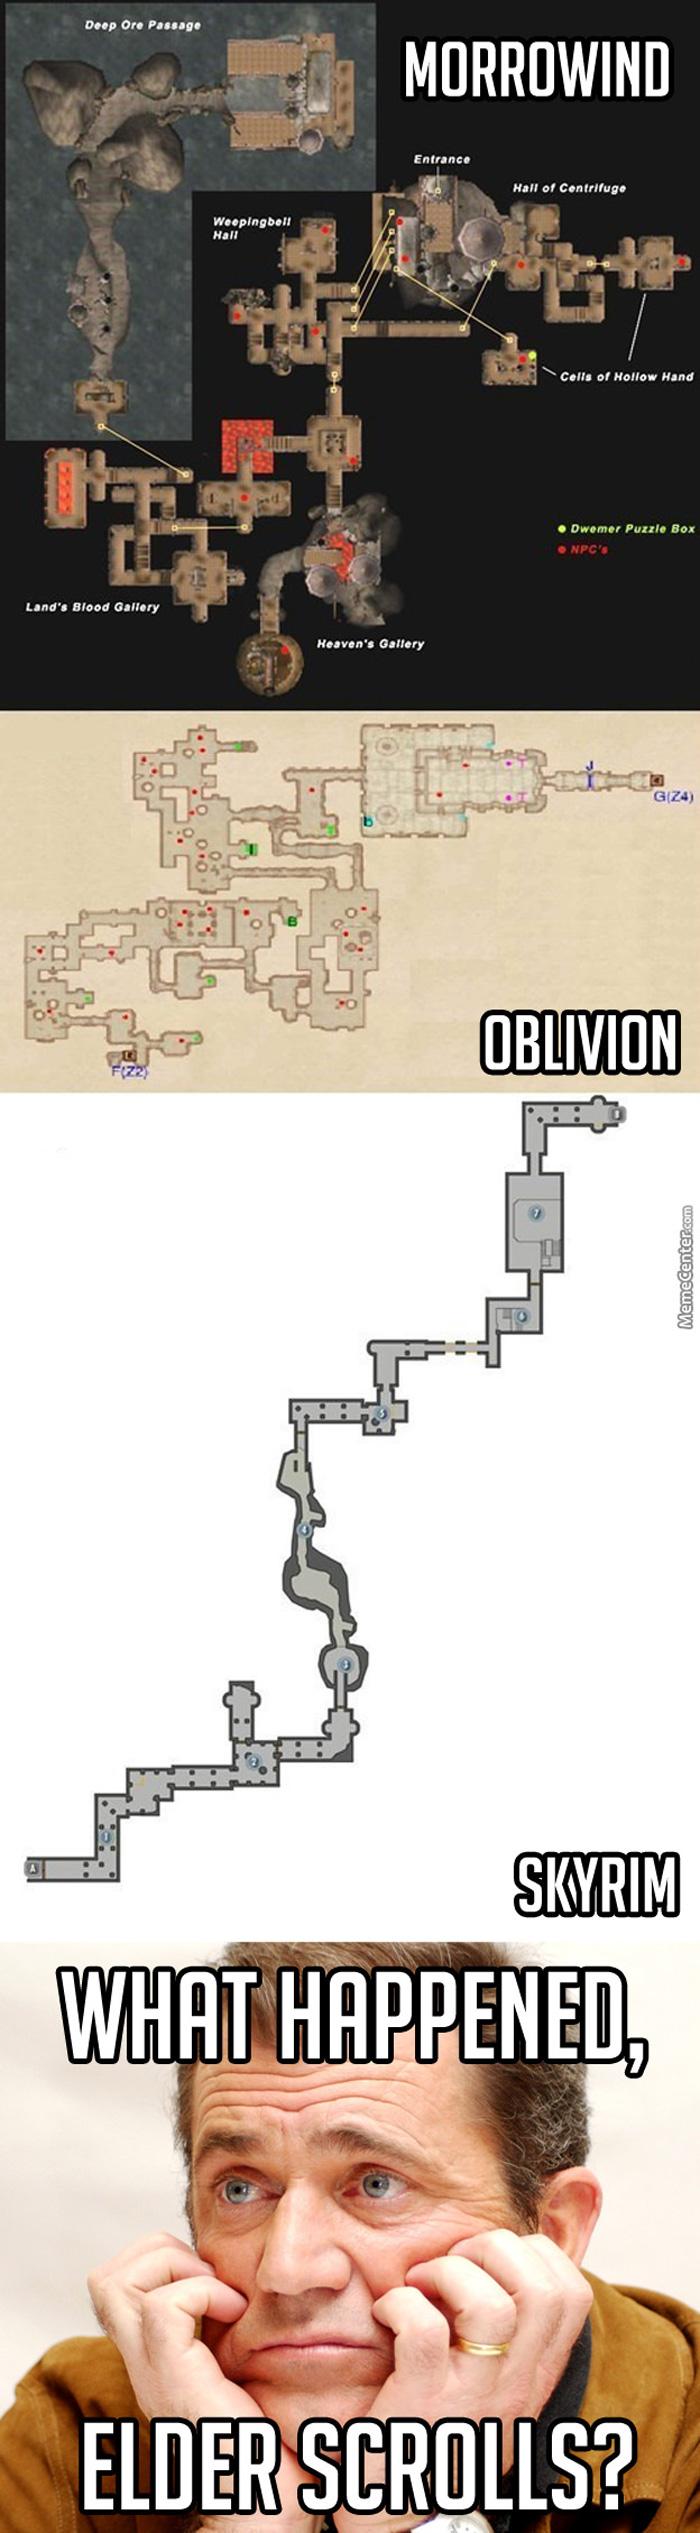 Elder Scrolls Memes